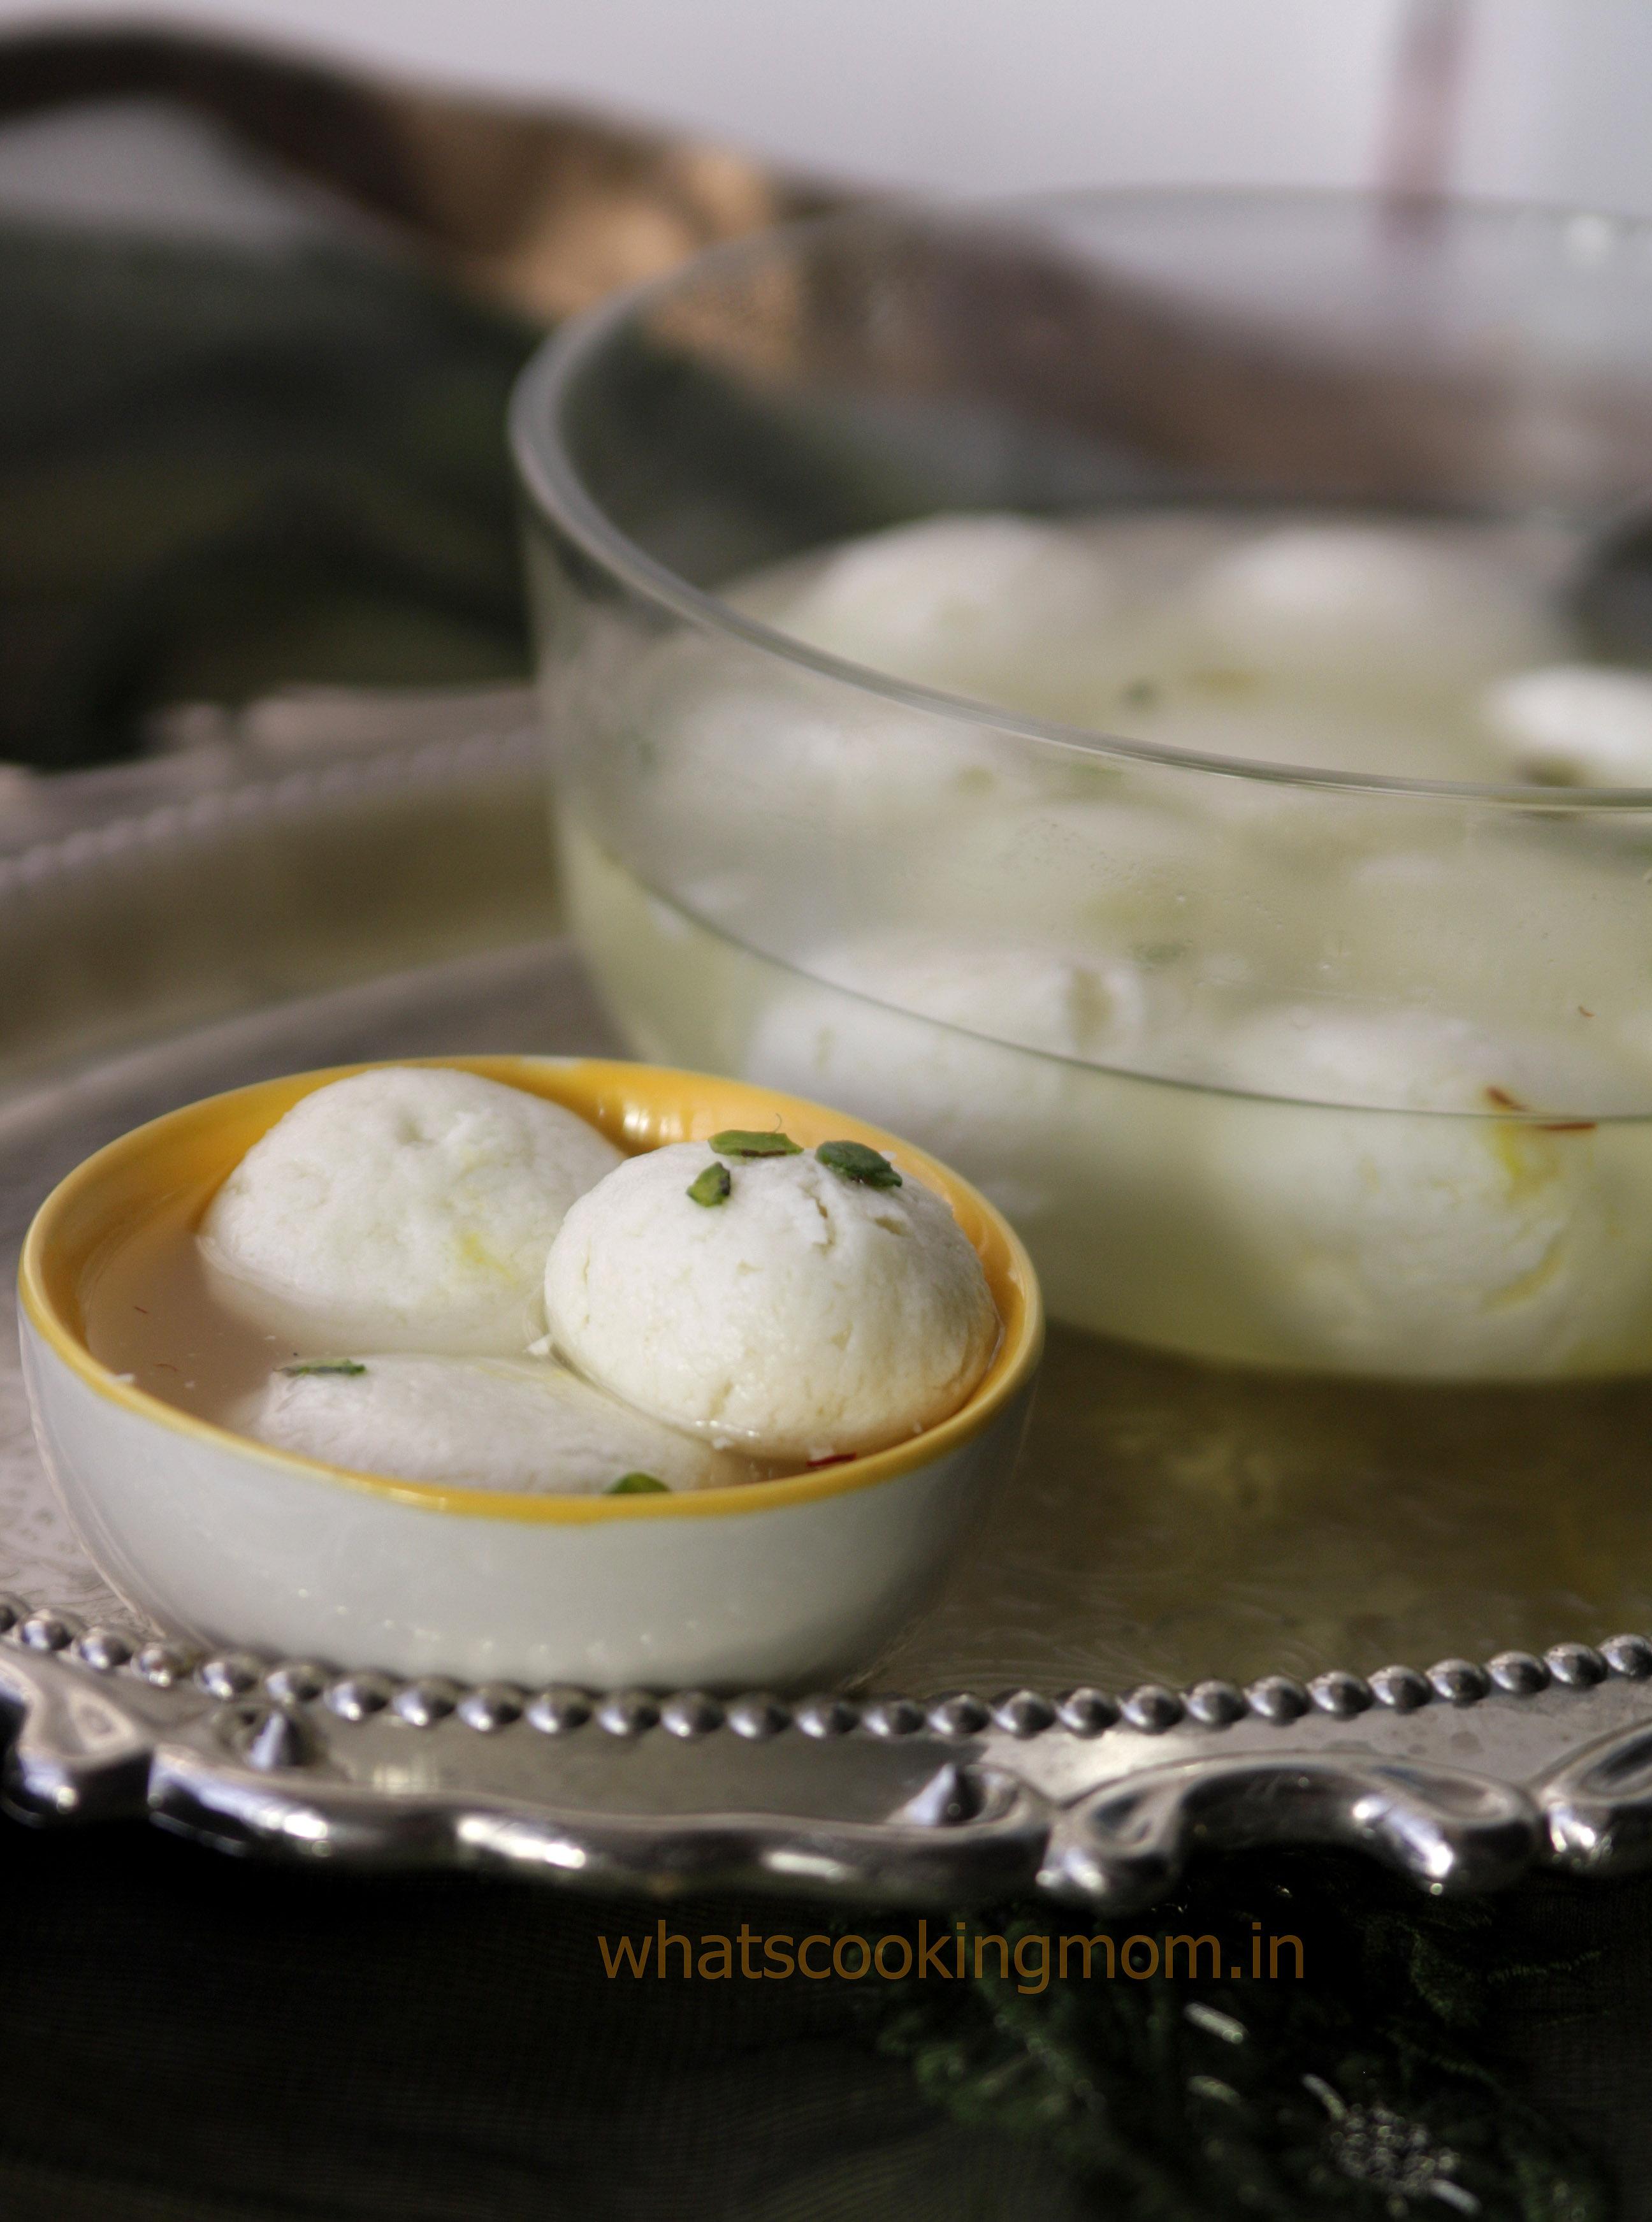 rasgulla - a very popular Indian Sweet